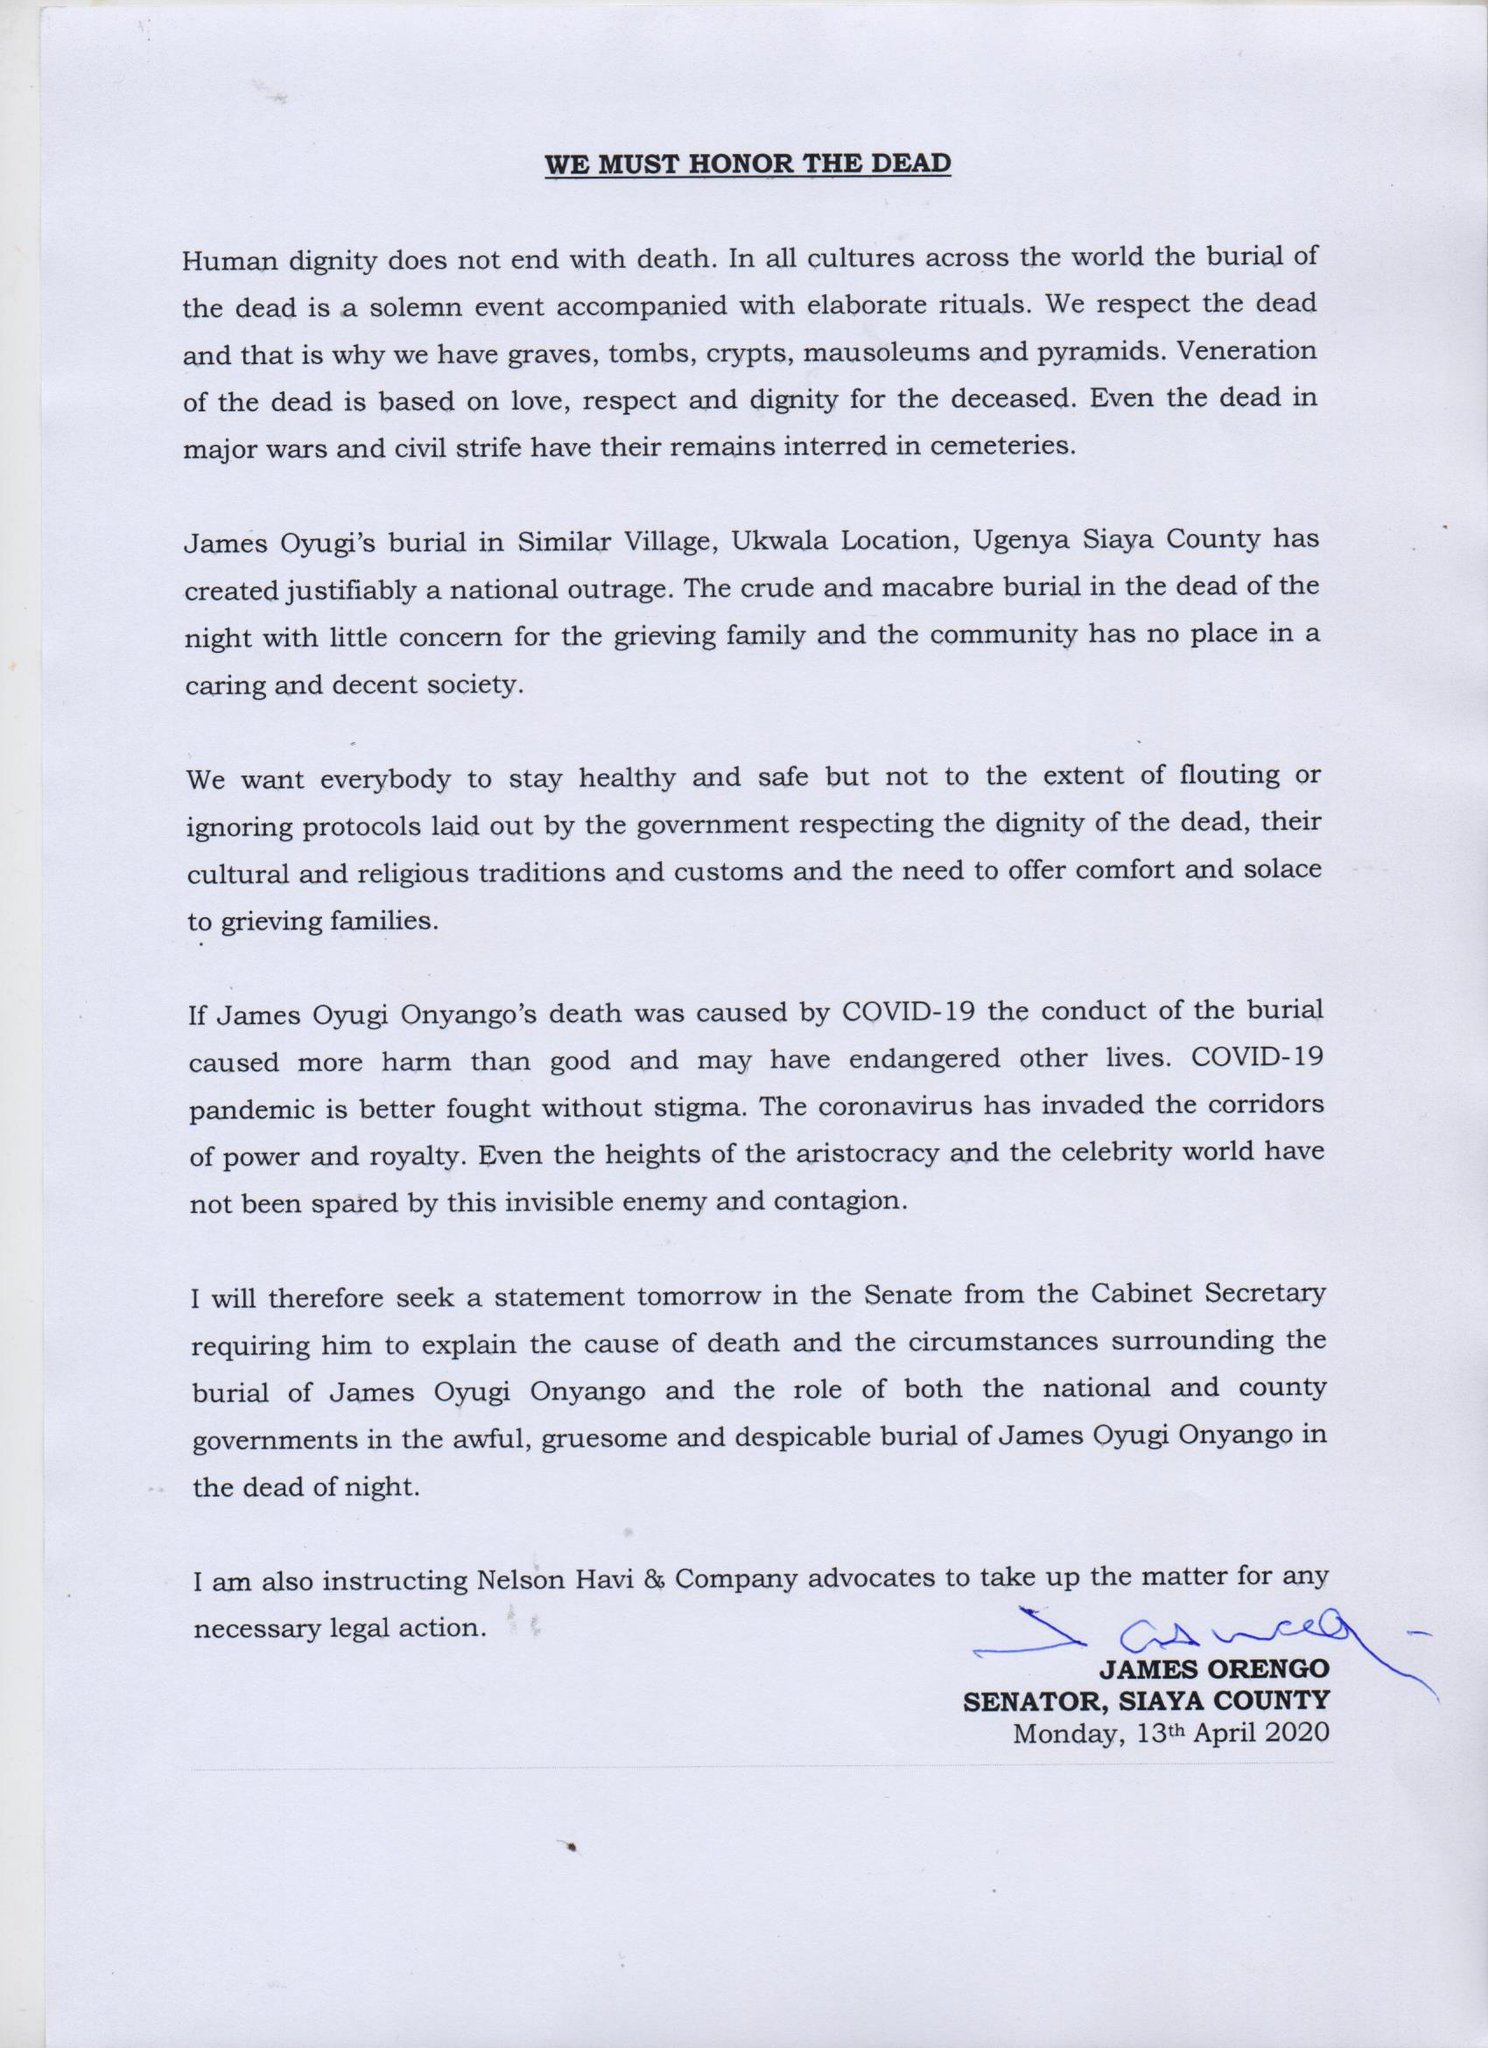 Orengo Takes on Govt Over Bizarre Burial of Siaya Covid-19 ...